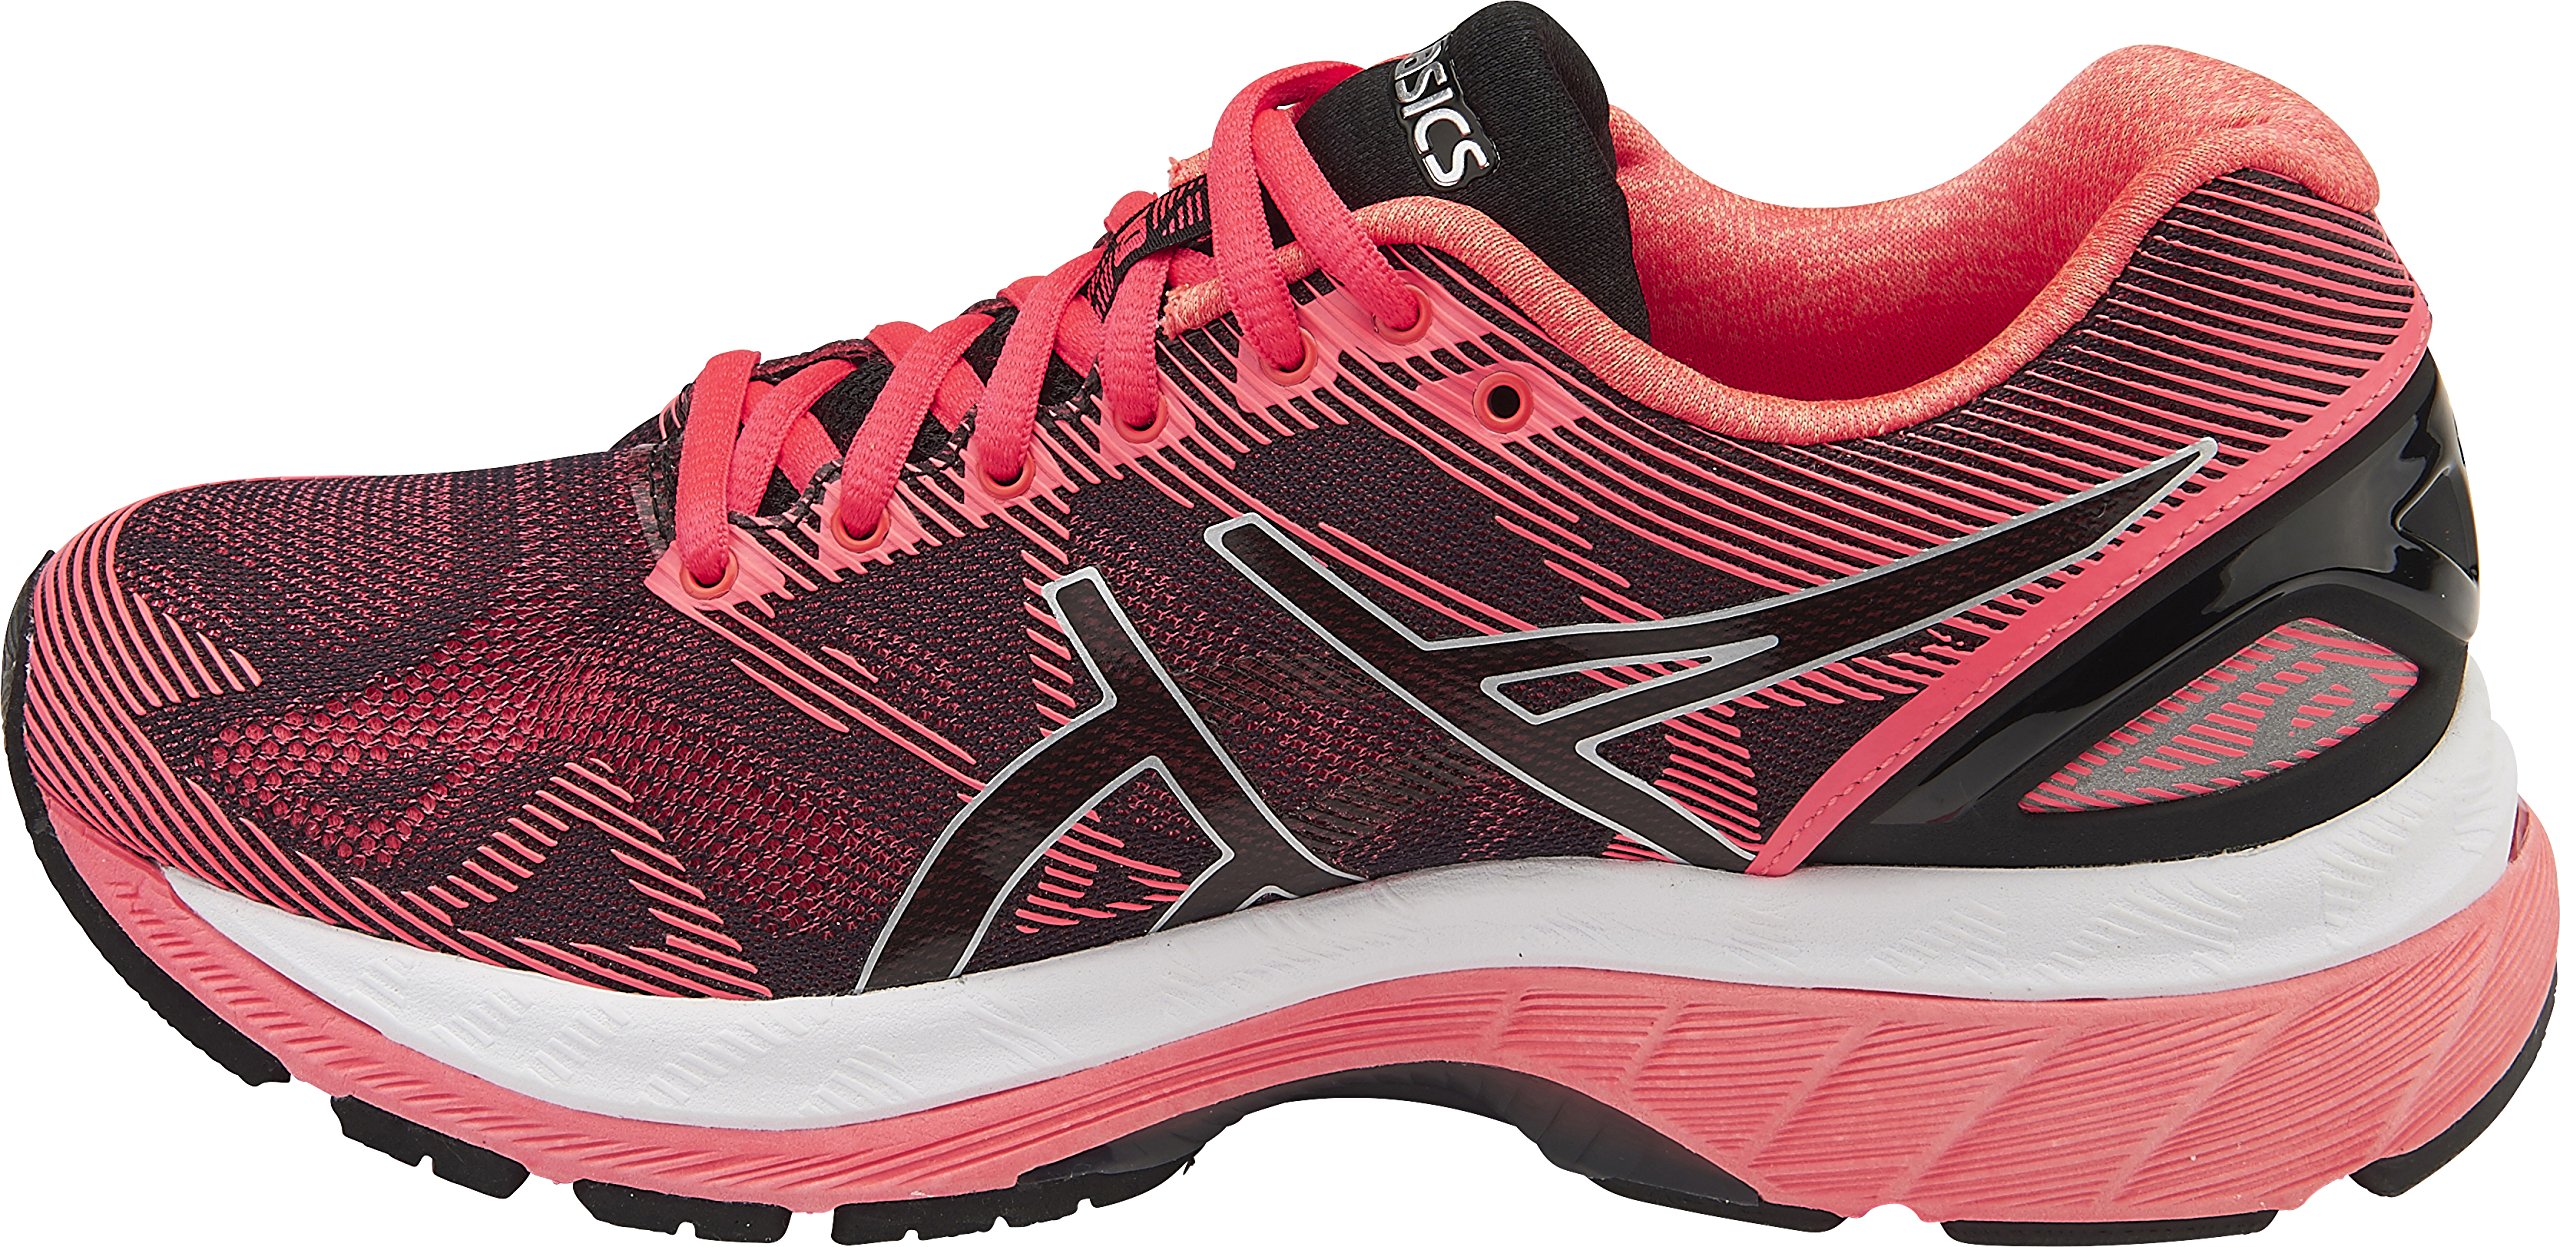 competitive price 773f9 f7a83 Galleon - ASICS Womens Gel-Nimbus 19 Running Shoe, Black Silver Pink, 7  B(M) US